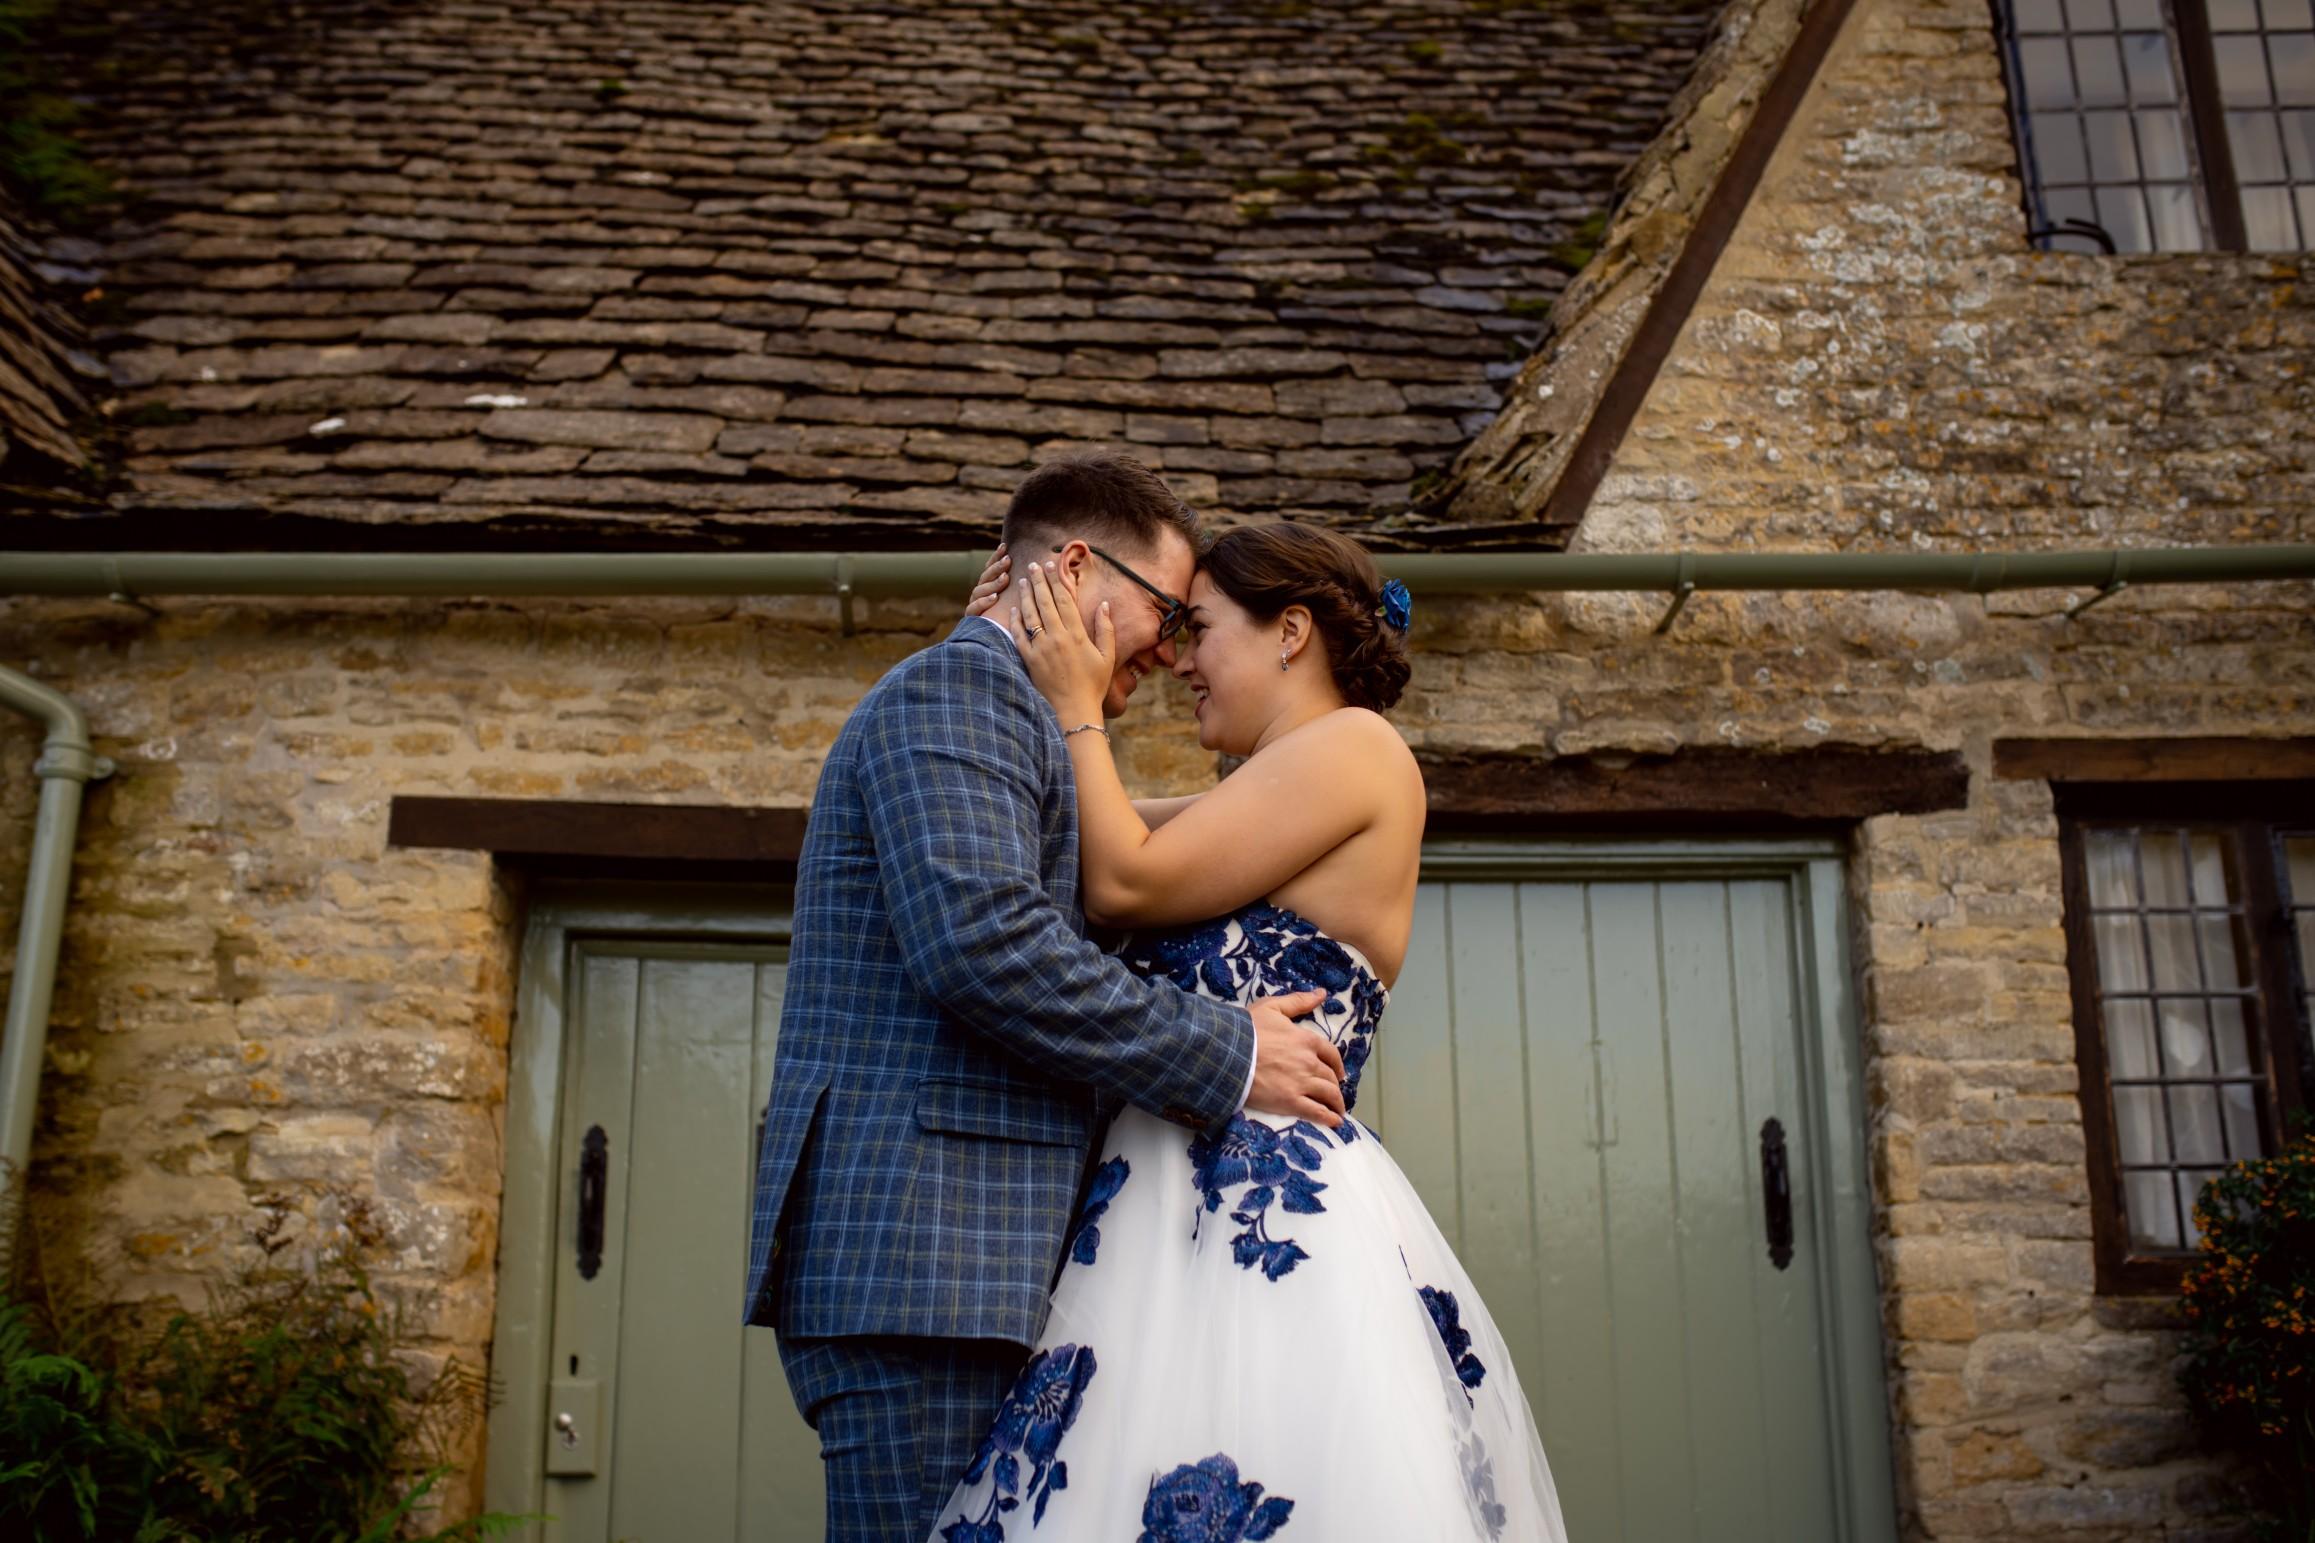 cotswolds wedding shoot - unique wedding dress and blue grooms suit